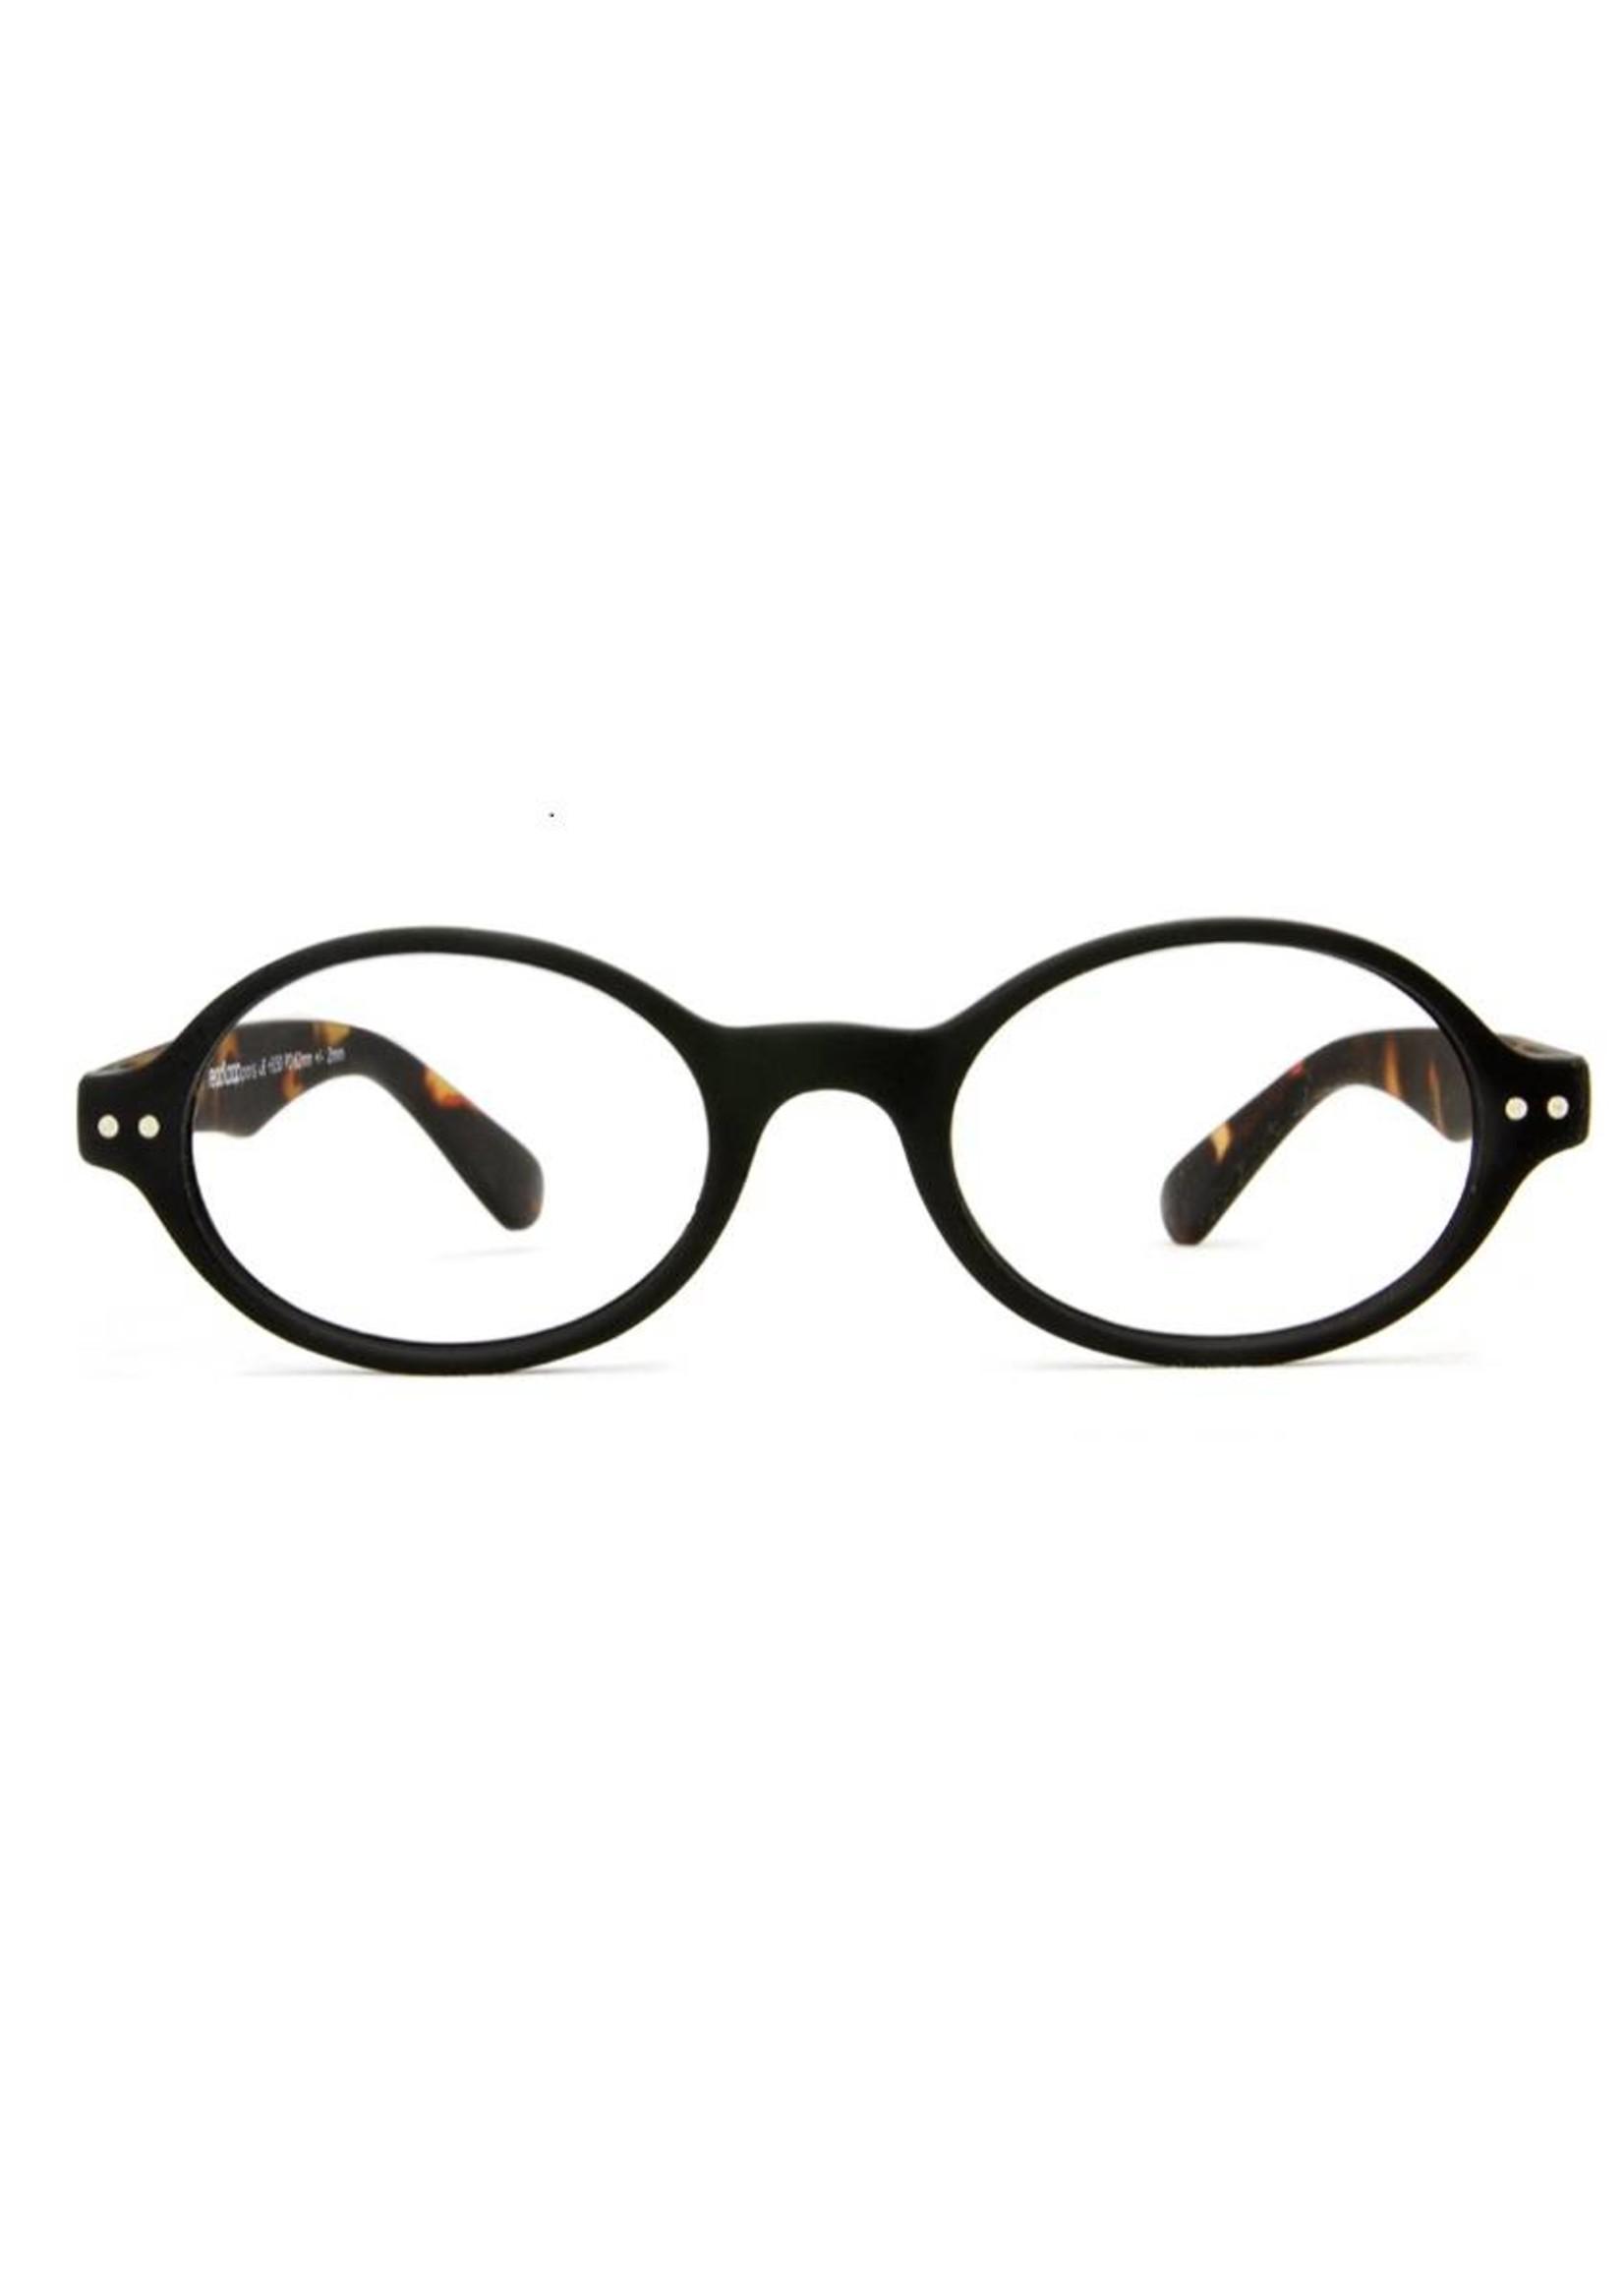 Readloop leesbrillen Leesbril Readloop Florida 2603-02 Havanna